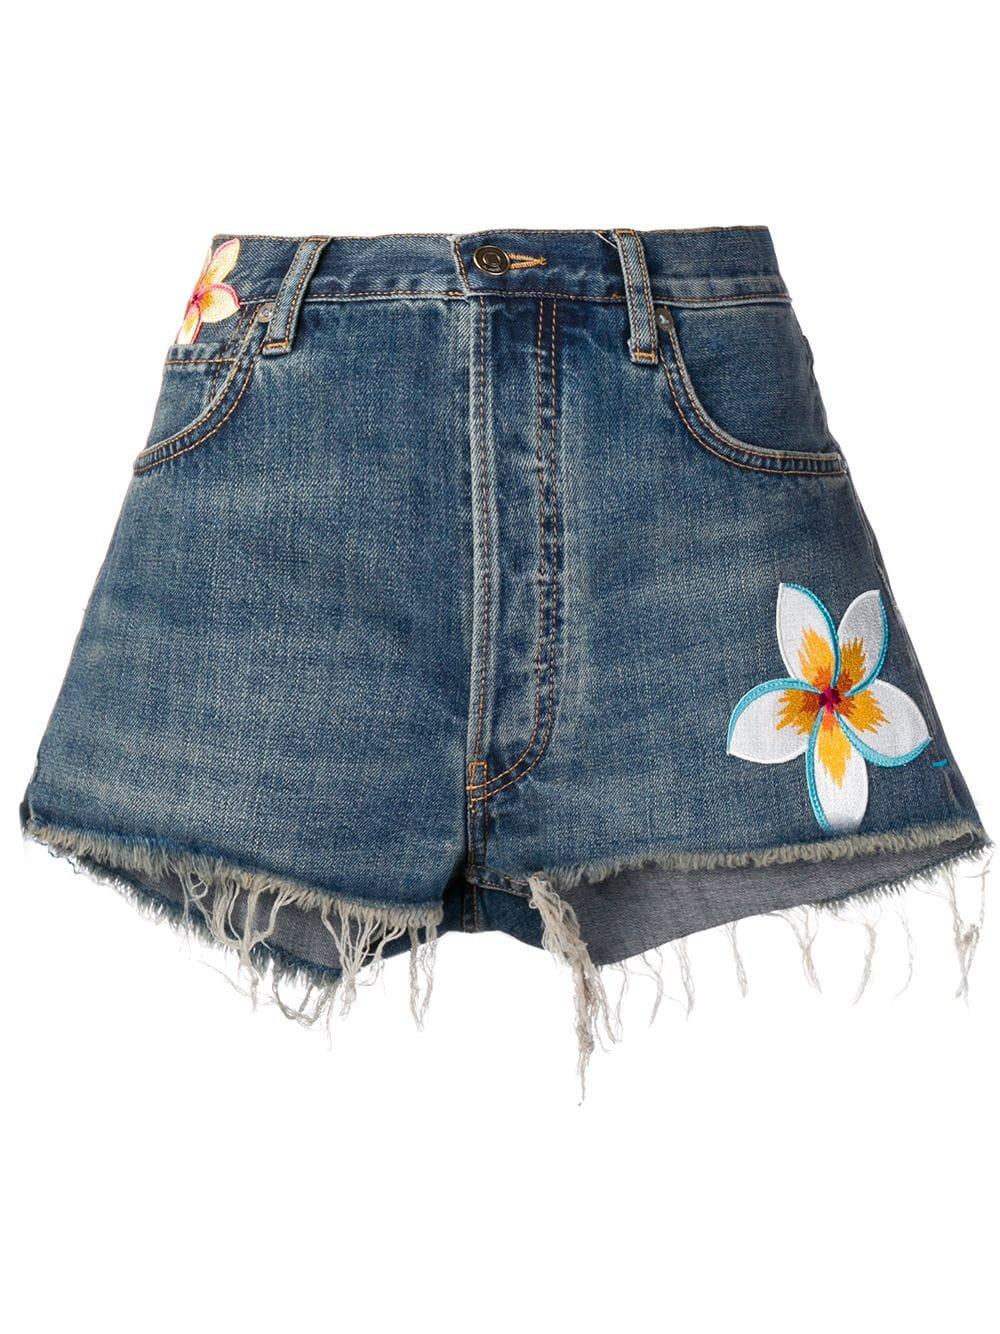 Alanui Flower Patch Denim Shorts - Farfetch